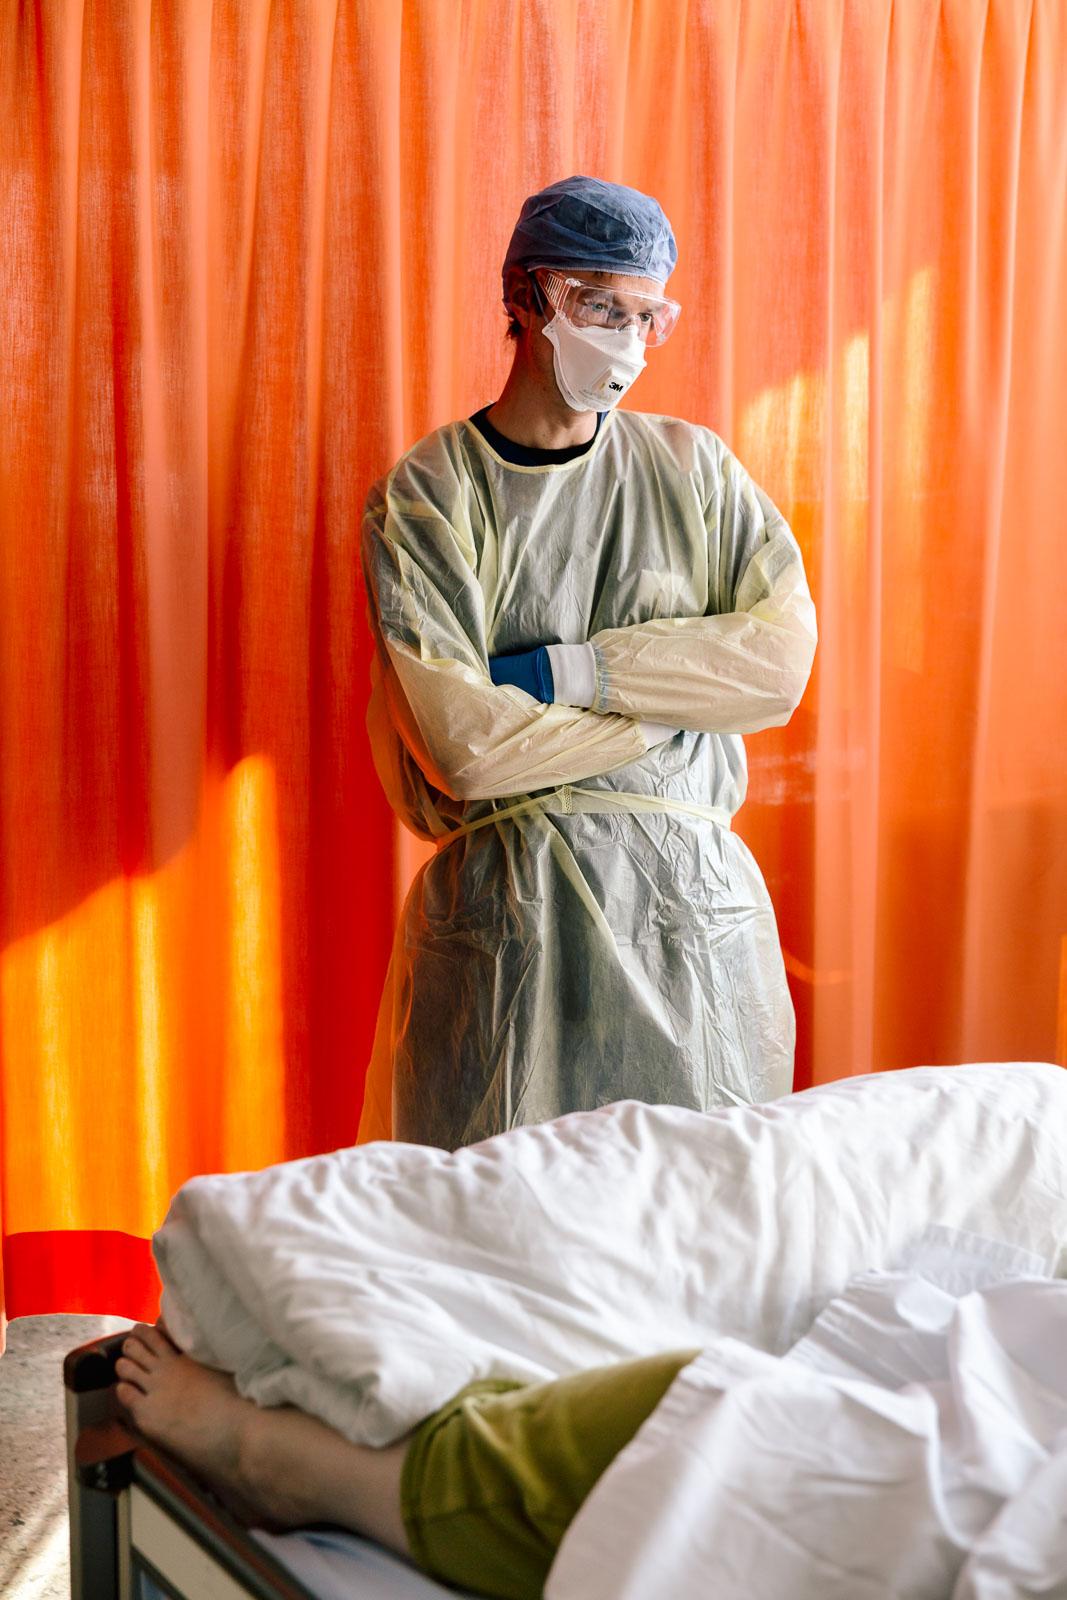 Oberarzt vor dem Bett seiner Patientin